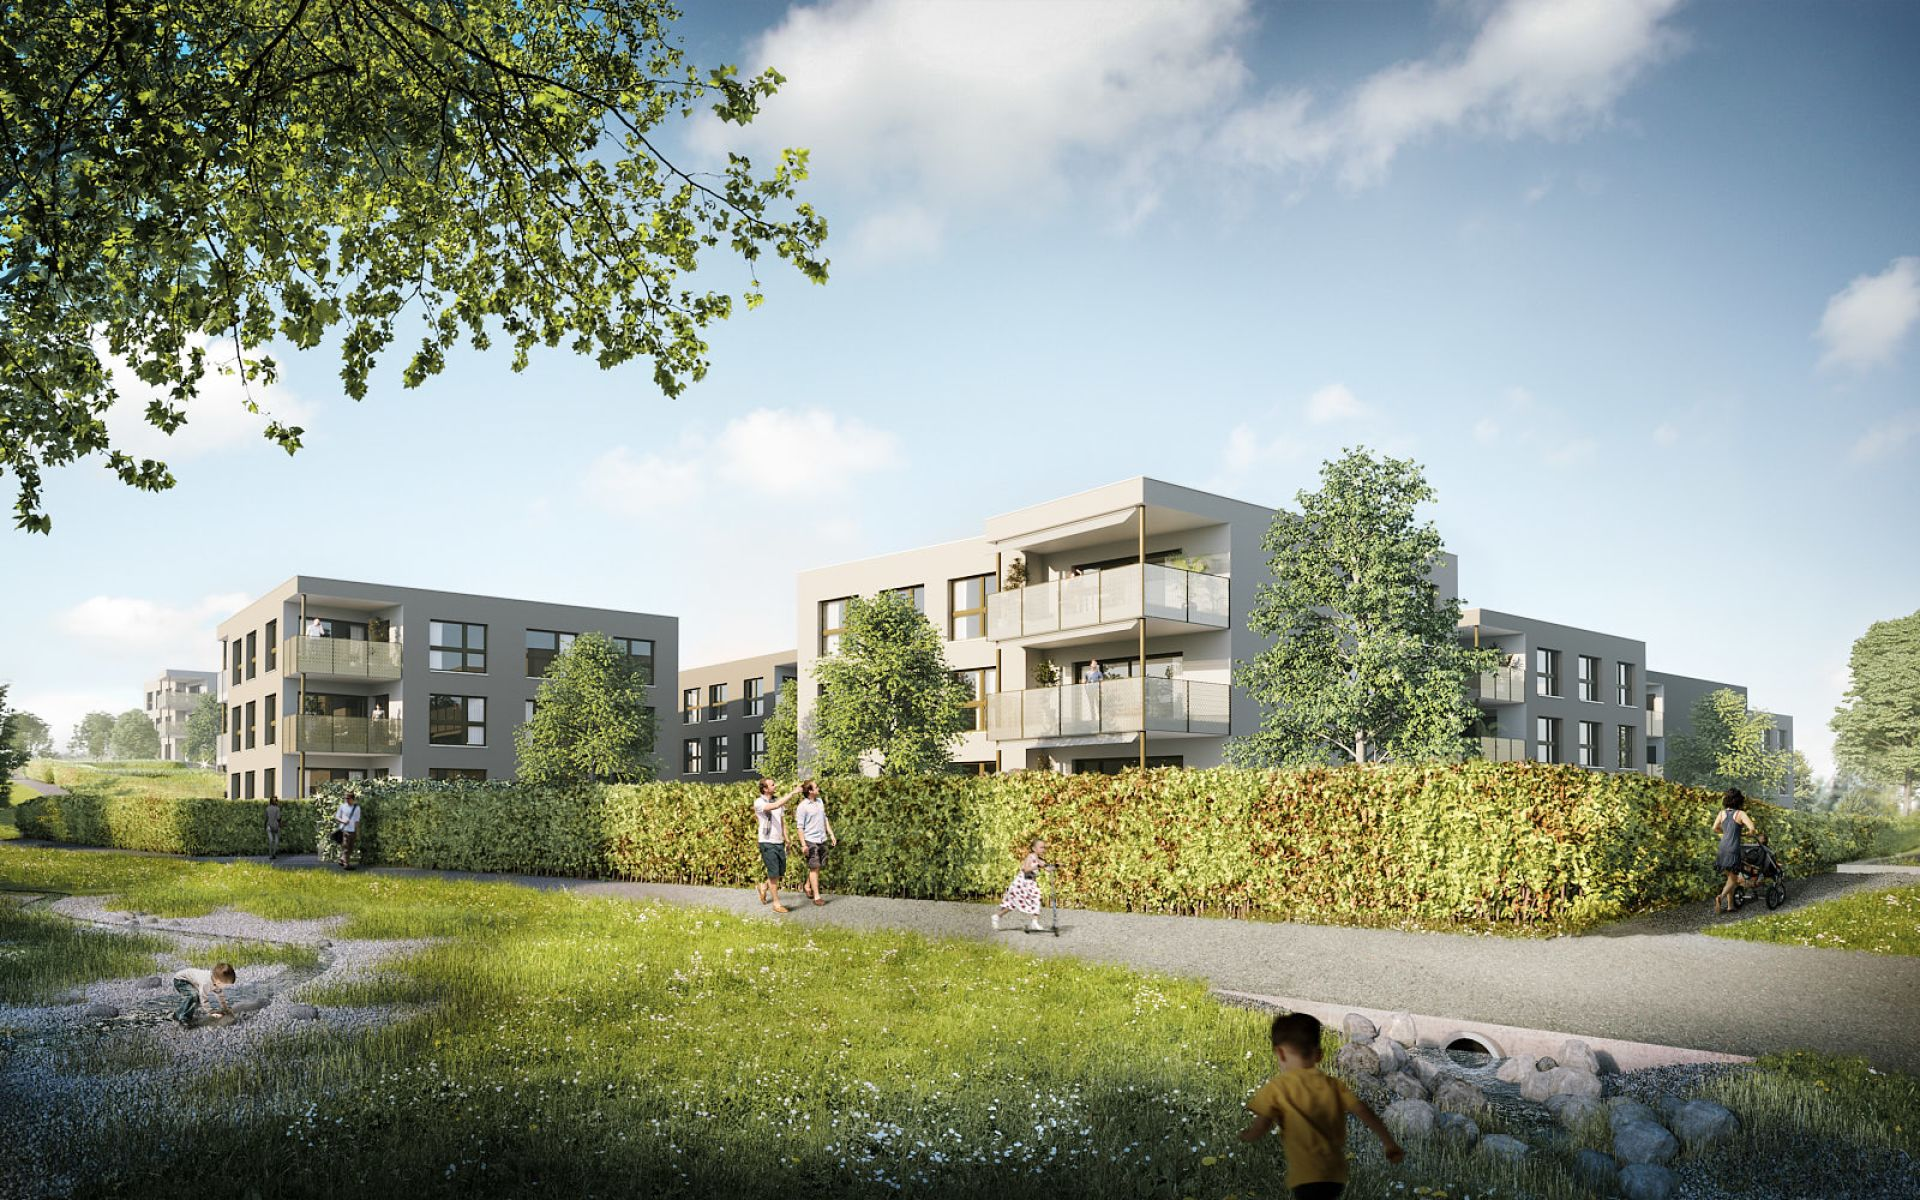 Miete: Neubau - Wohnung mit Balkon